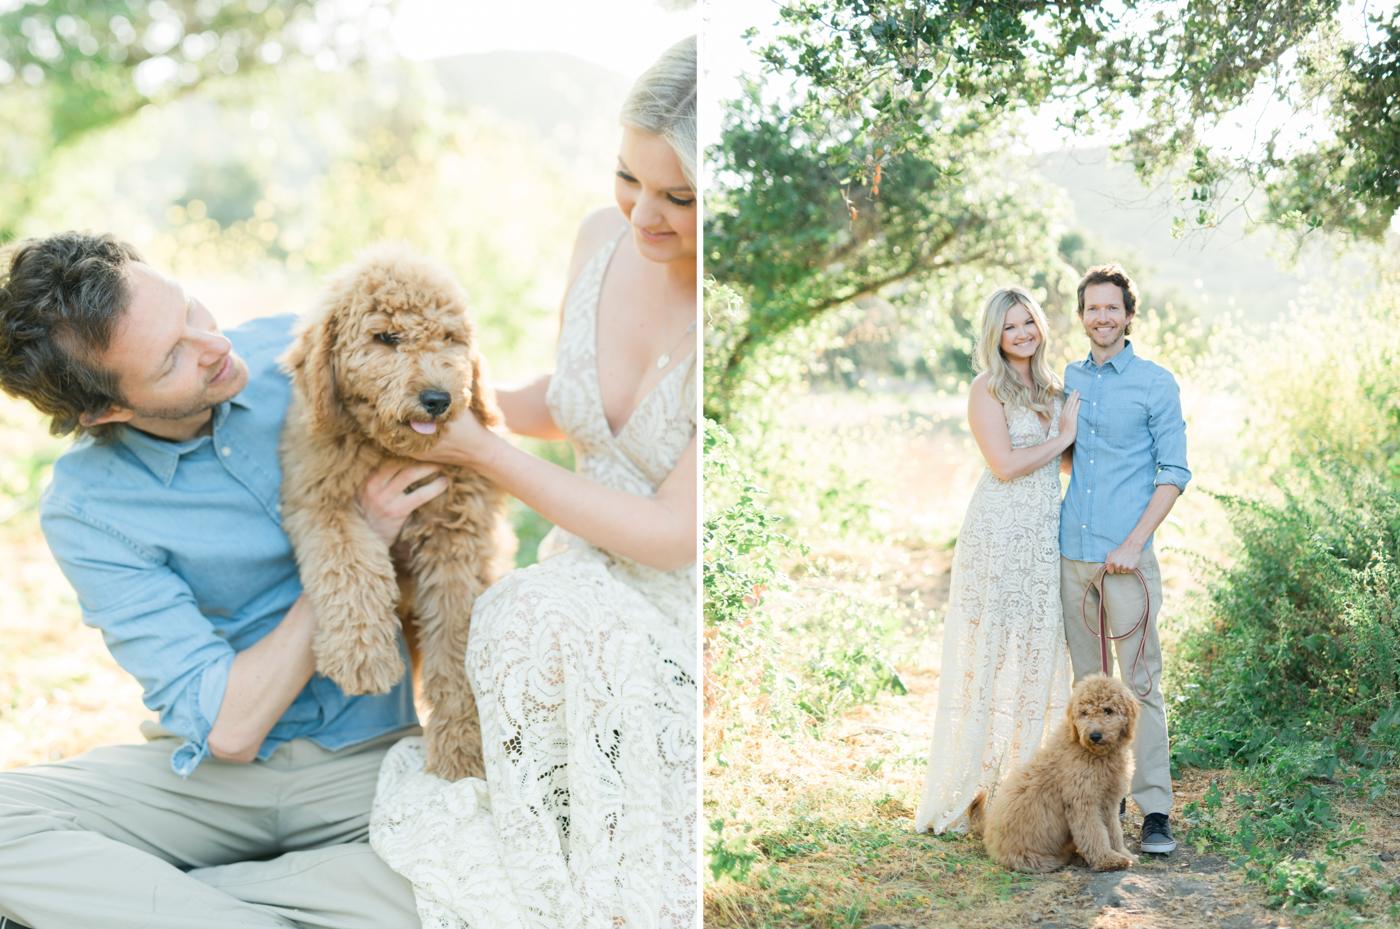 San_Juan_Capistrano_Goldendoodle_family_portrait_session_los_angeles_wedding_photographer-11.jpg